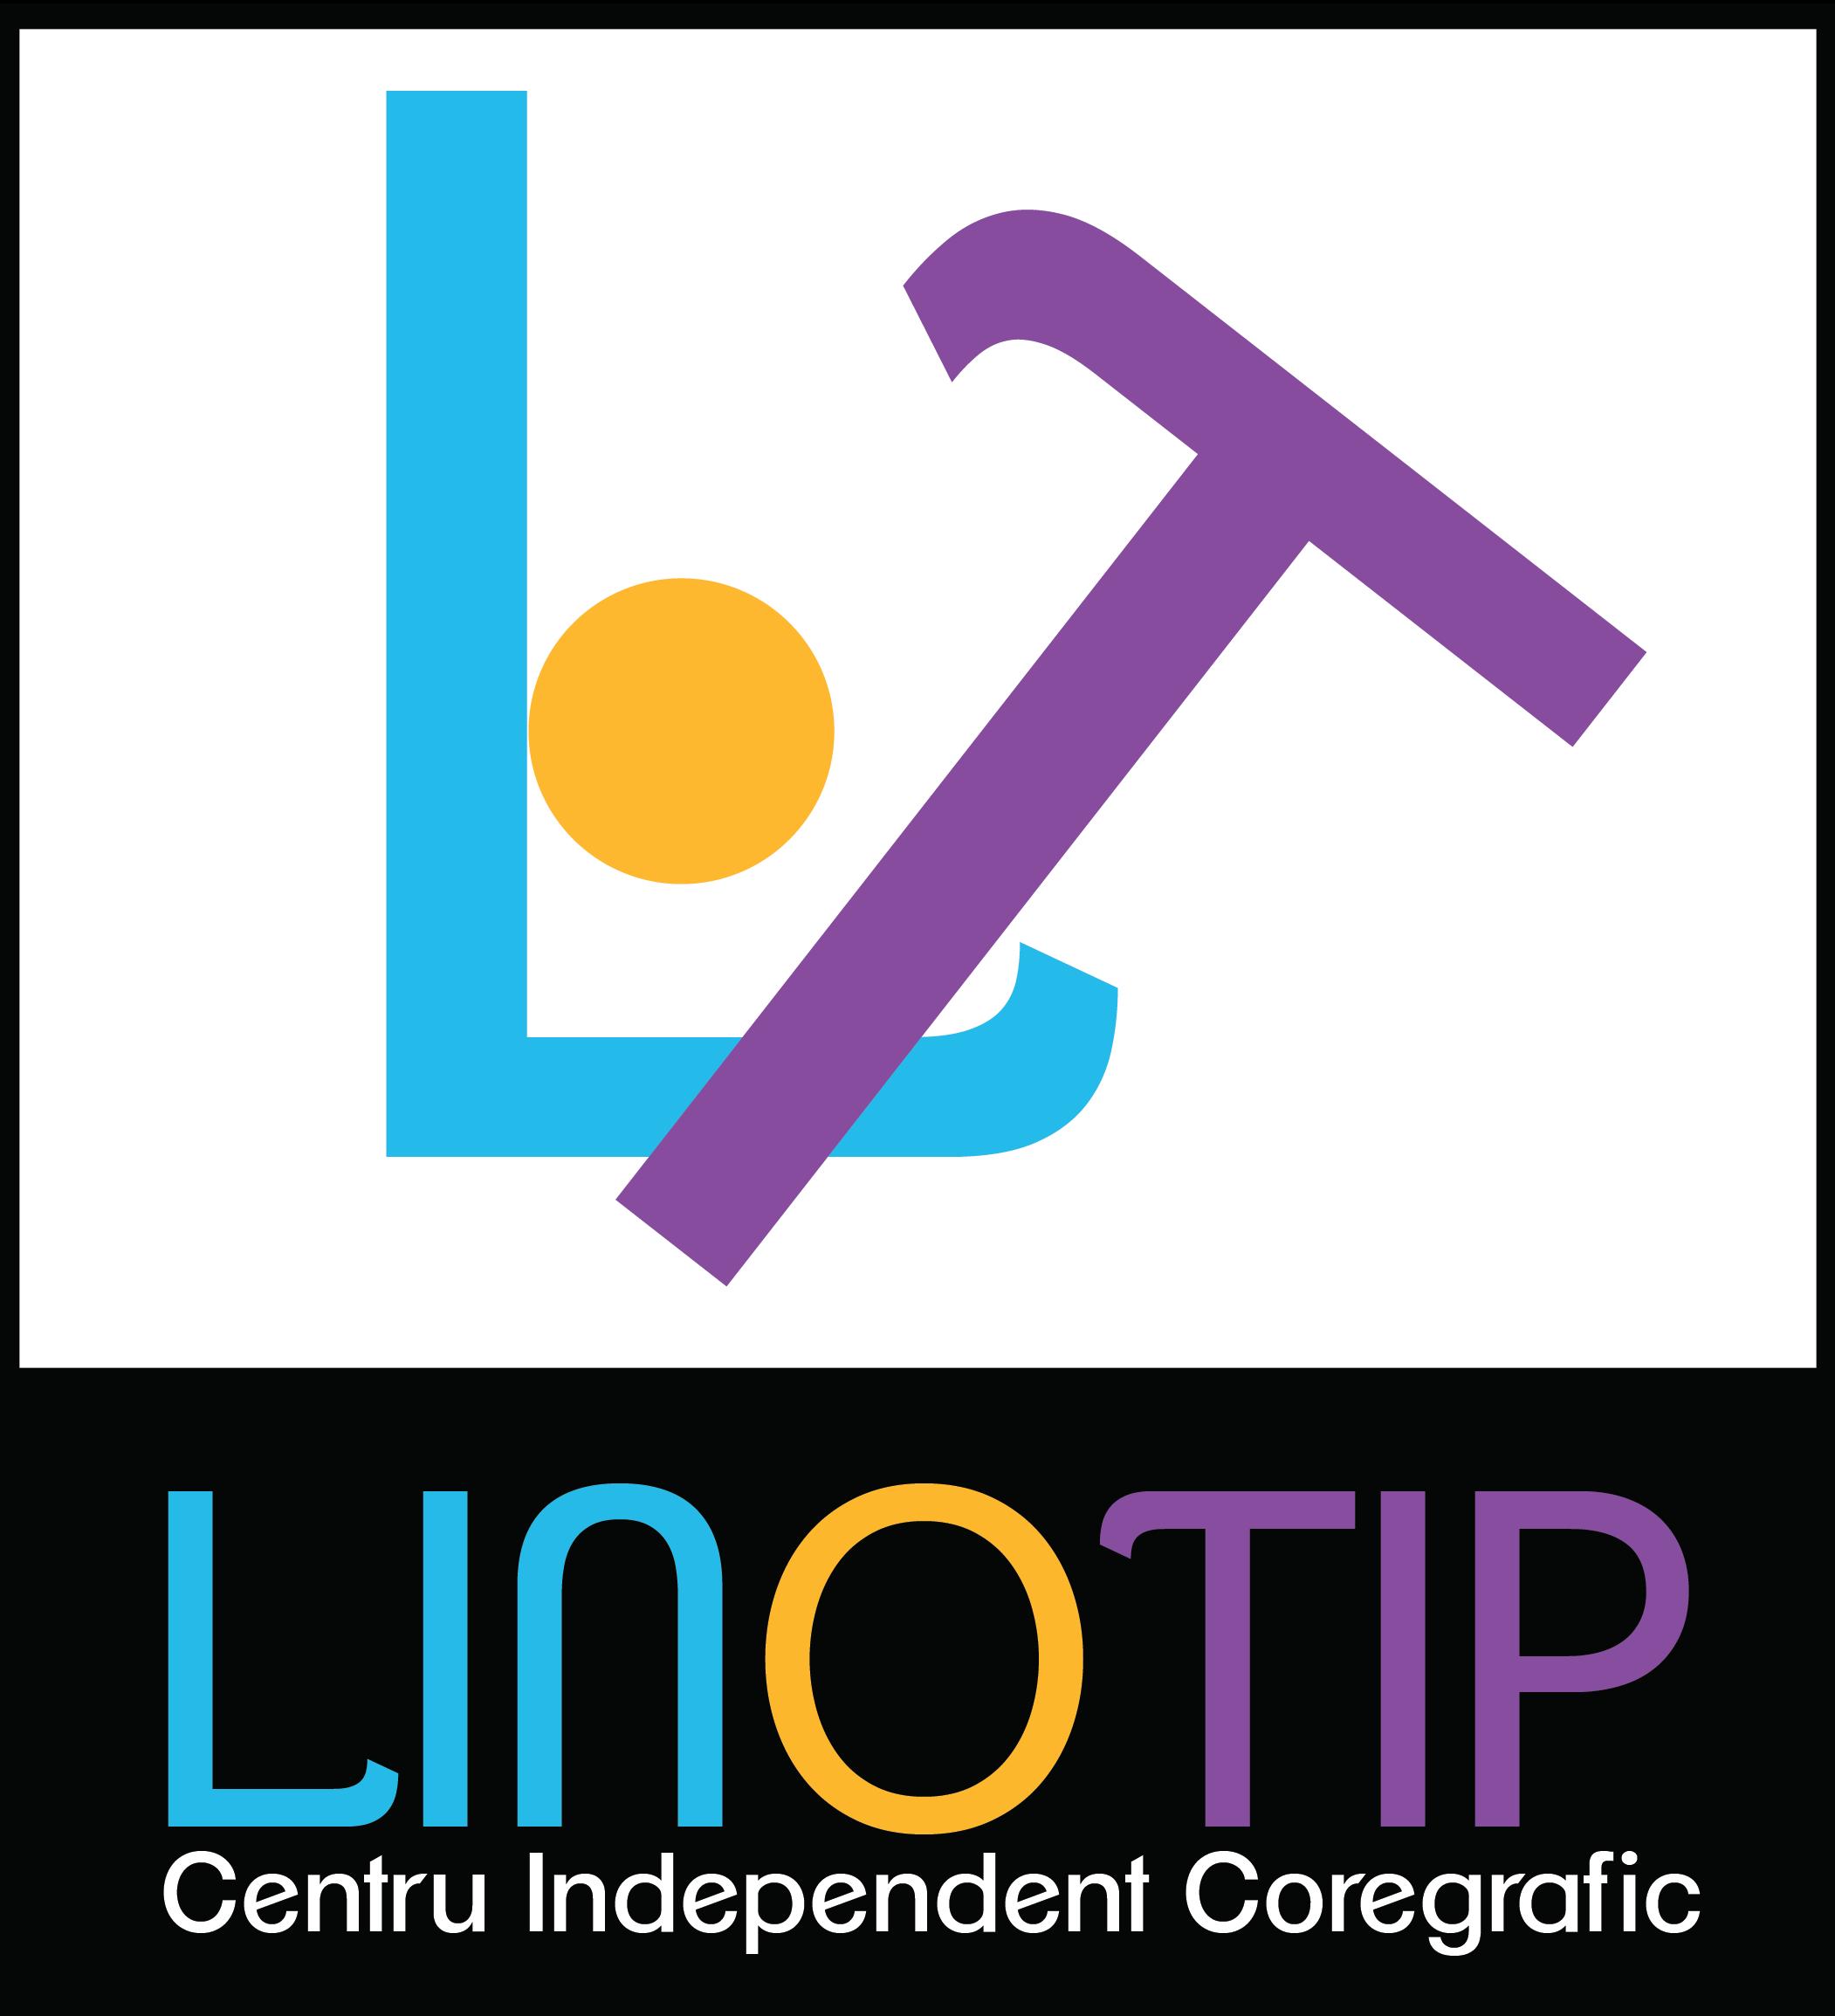 20. logo_linotip_v.png